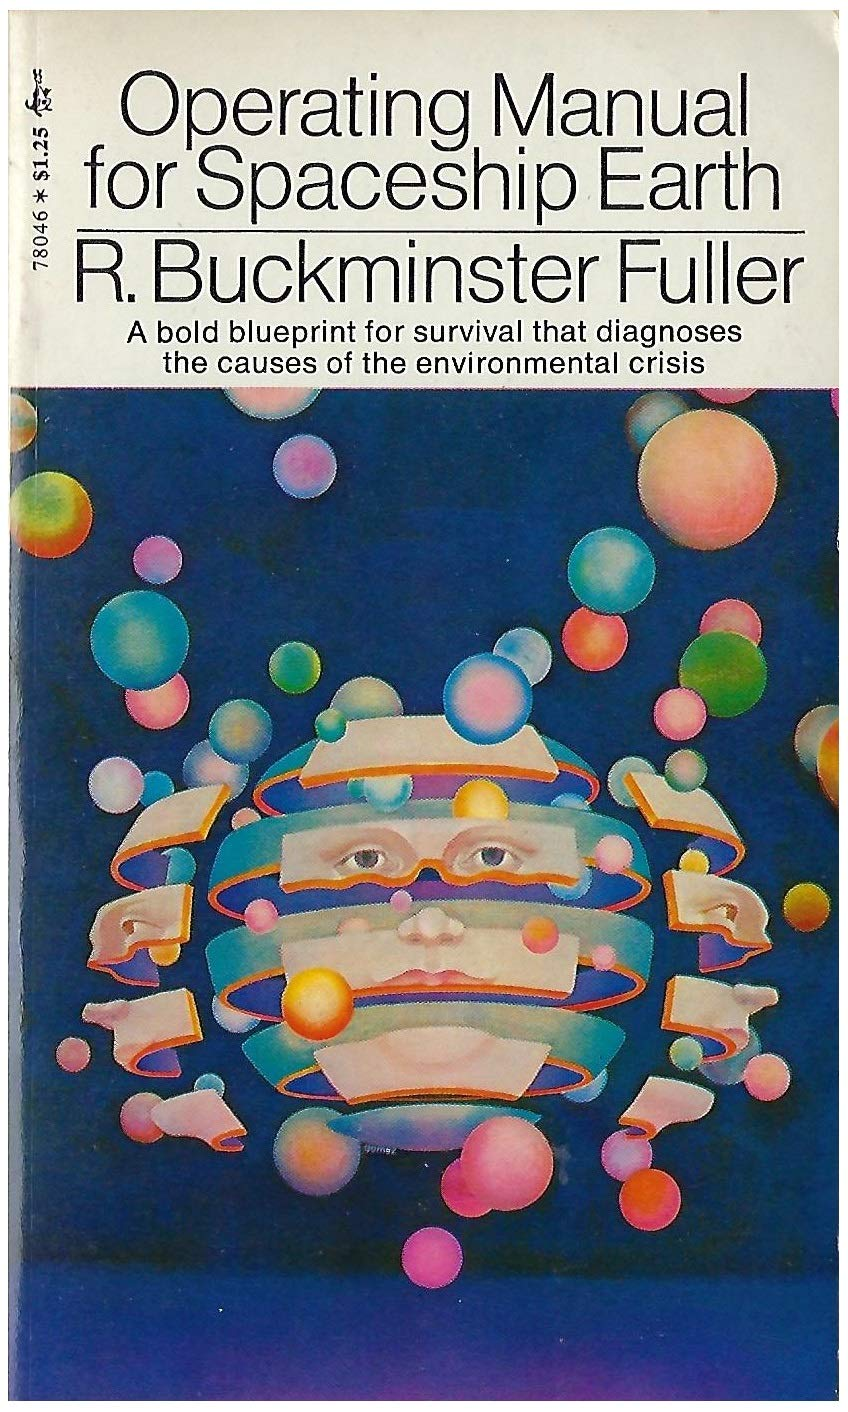 Operating Manual for Spaceship Earth: R. Buckminster Fuller: 9780671780463:  Amazon.com: Books